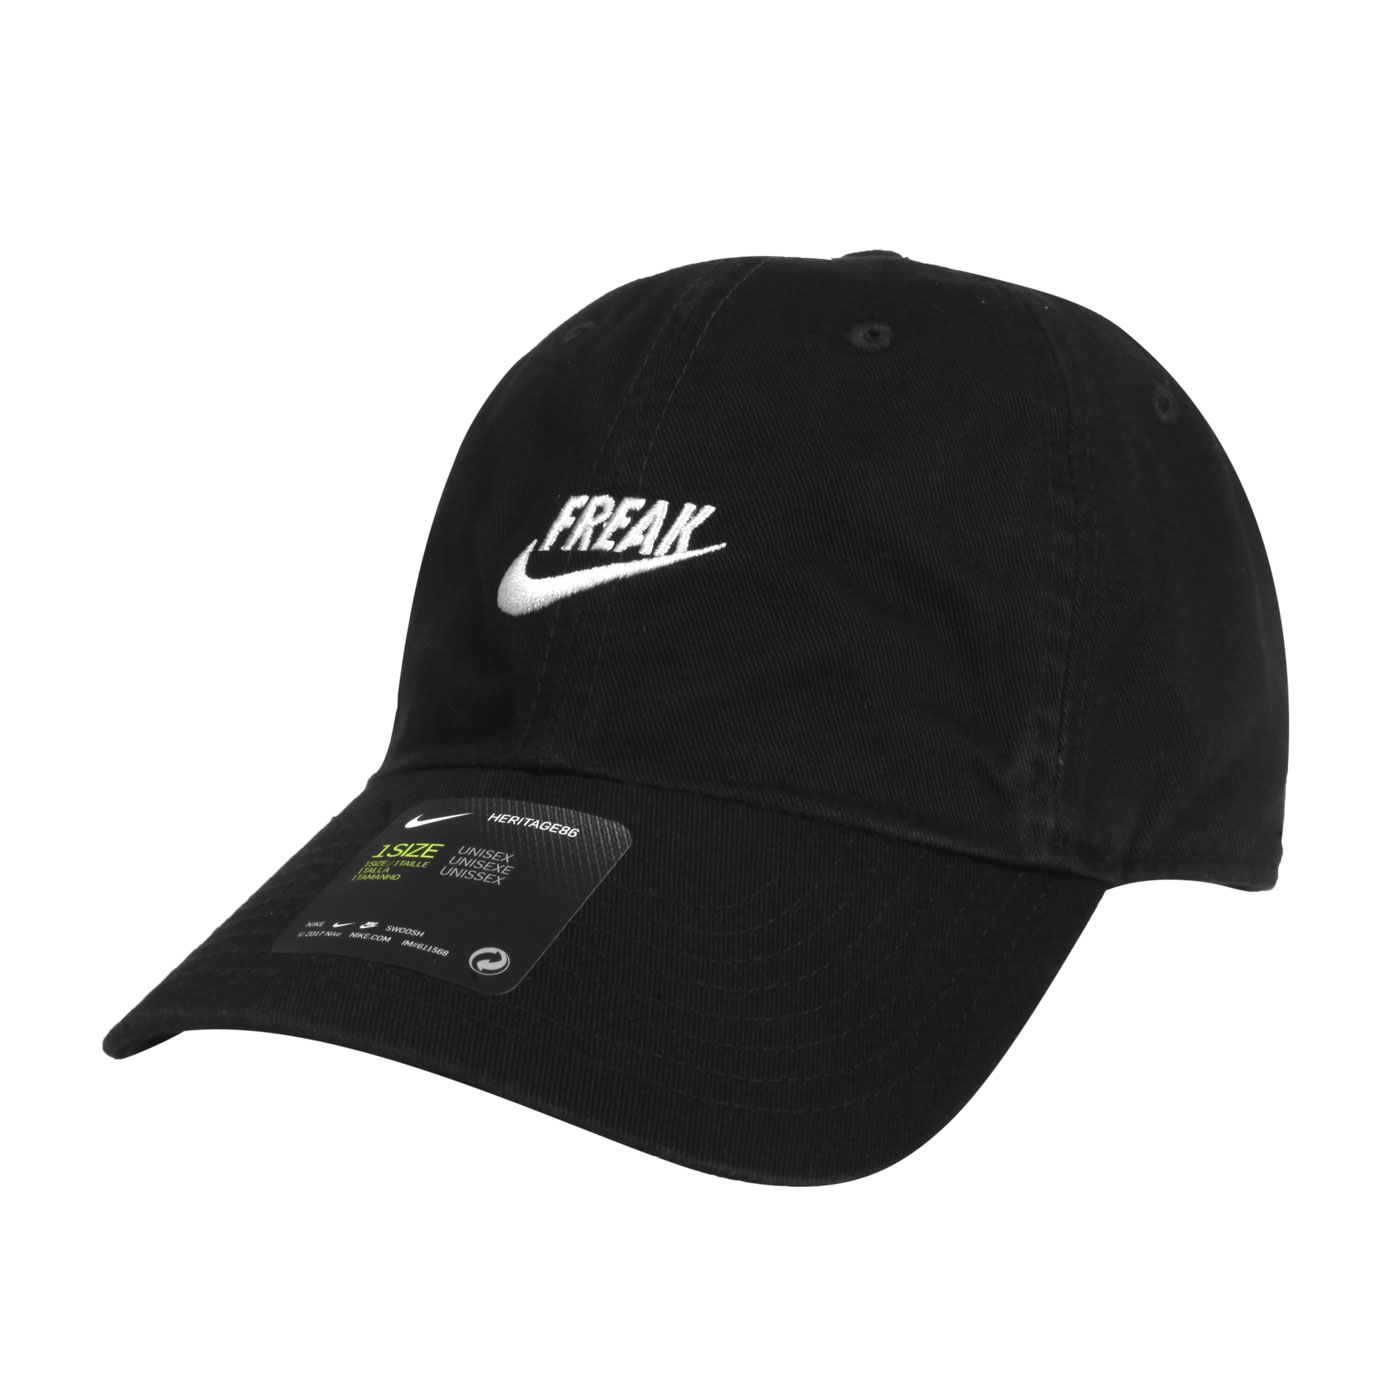 NIKE 運動帽 CW5921-010 - 黑淺灰